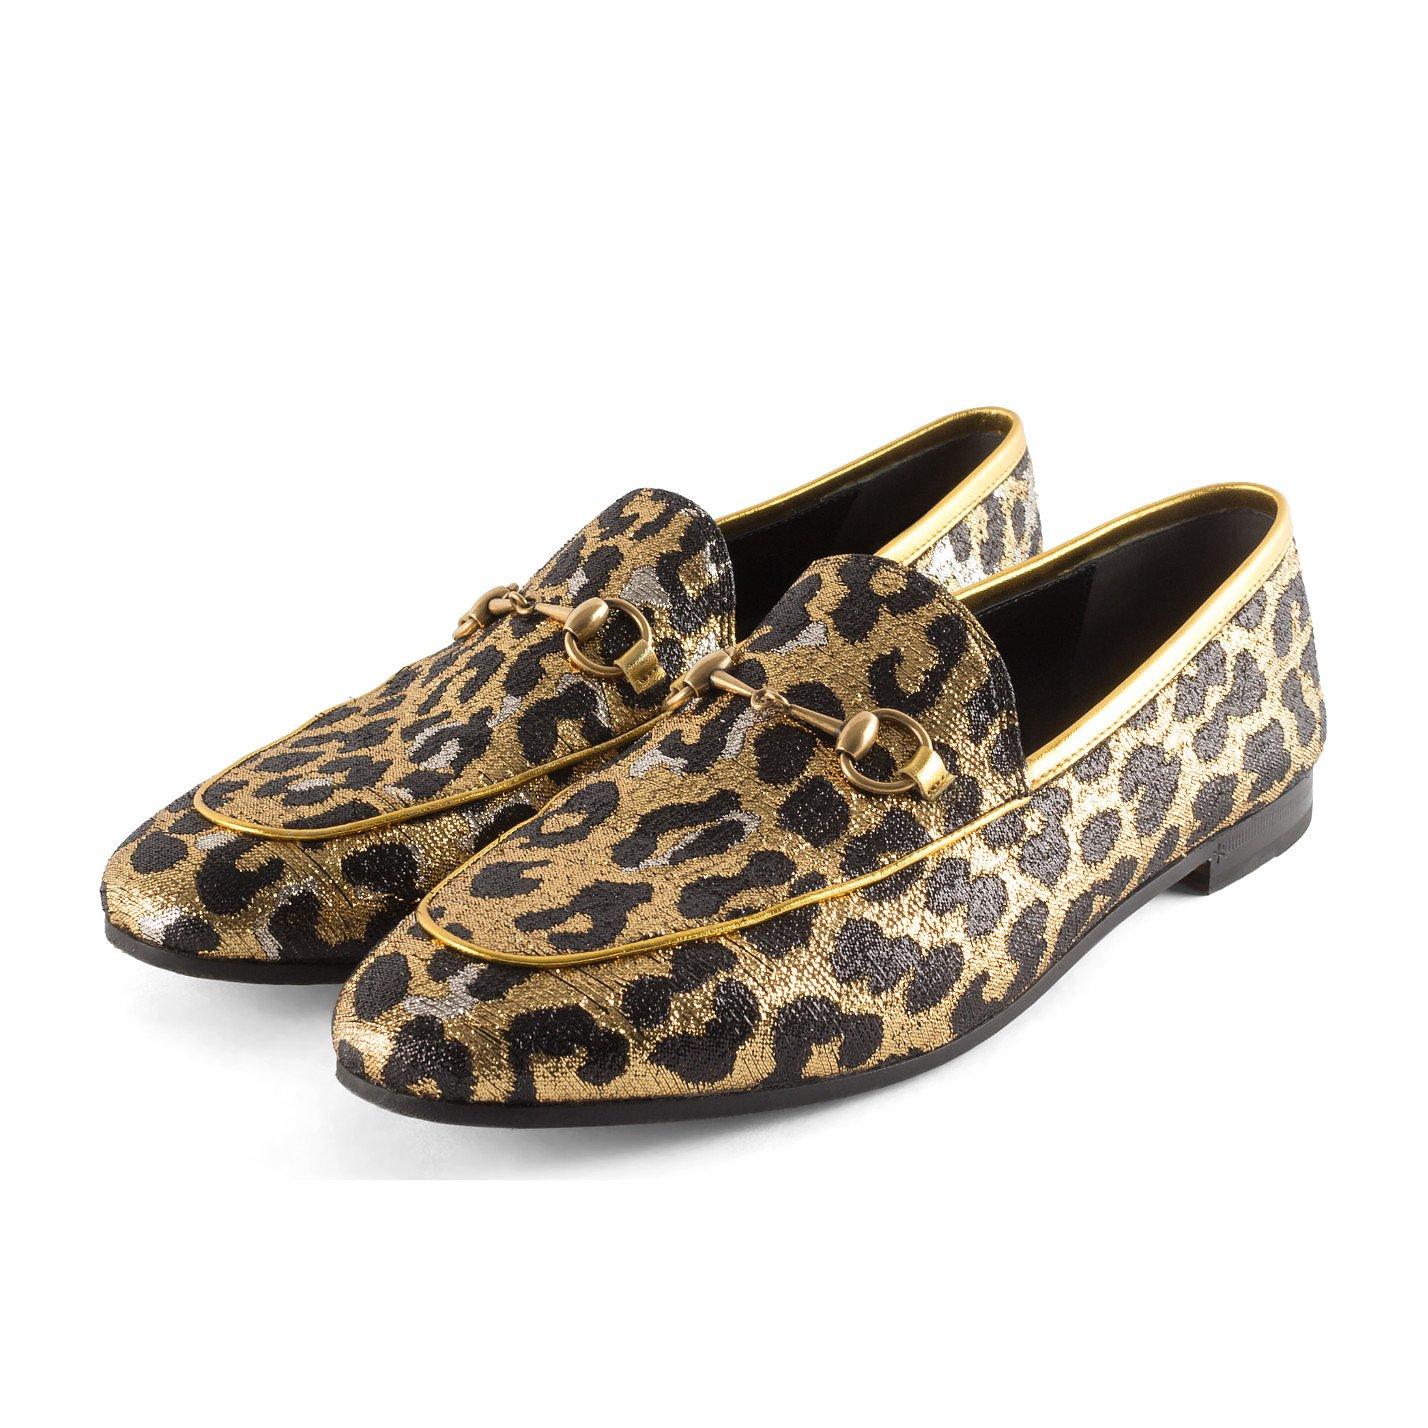 Gucci Leopard Print Metallic Loafers